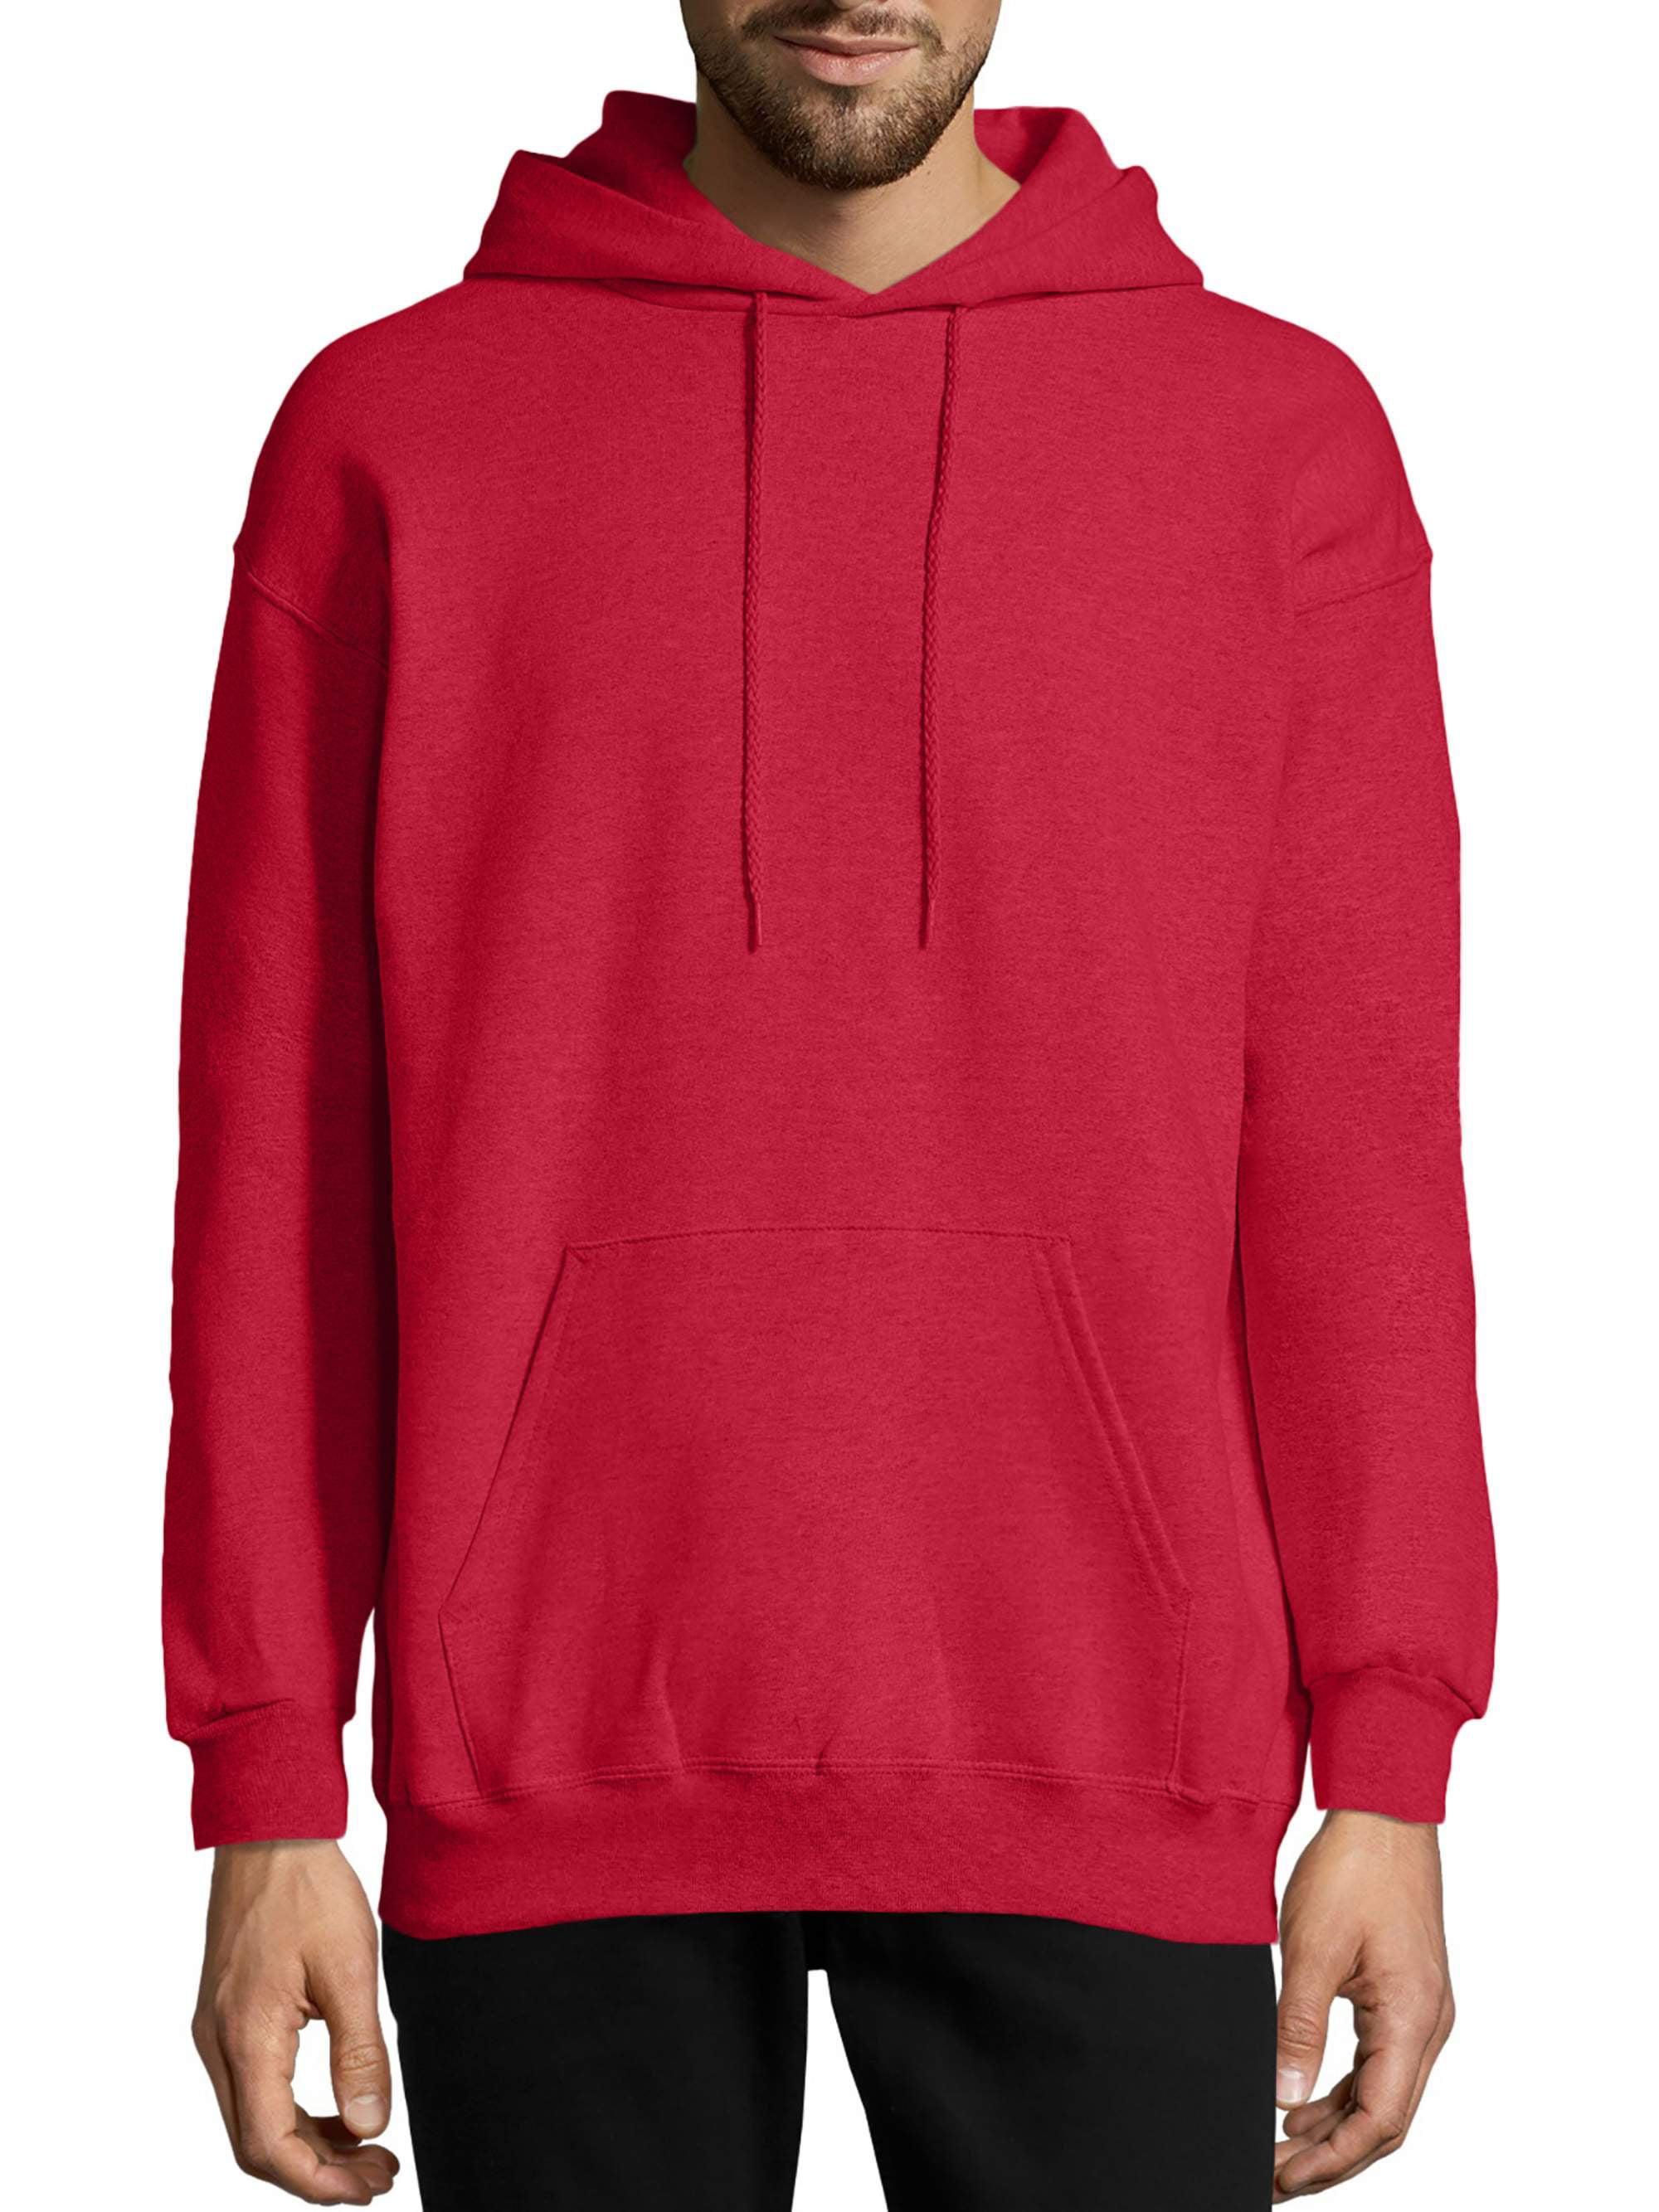 Hanes Mens EcoSmart Hooded Sweatshirt 2XL 1 Deep Red 1 Pale Pink